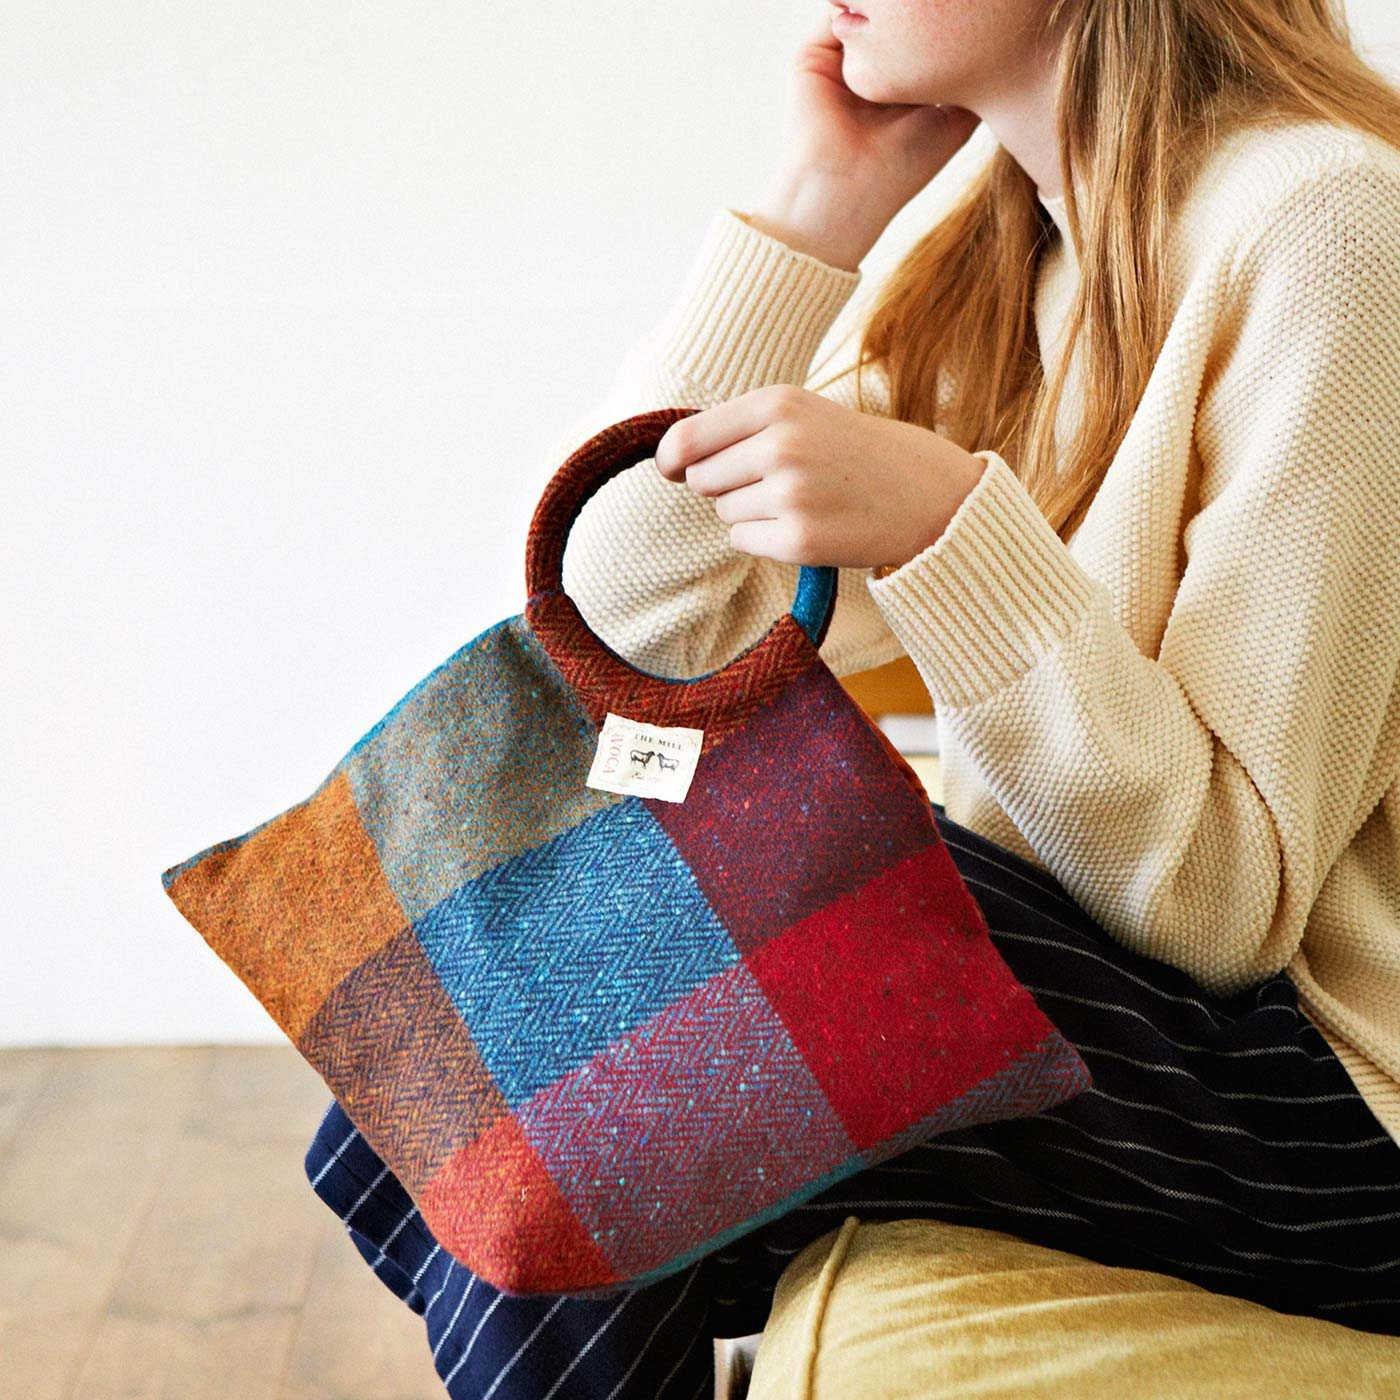 Couturier×AVOCA 鮮やか色のウールクロスで贅沢に仕立てるバッグ&ポーチ